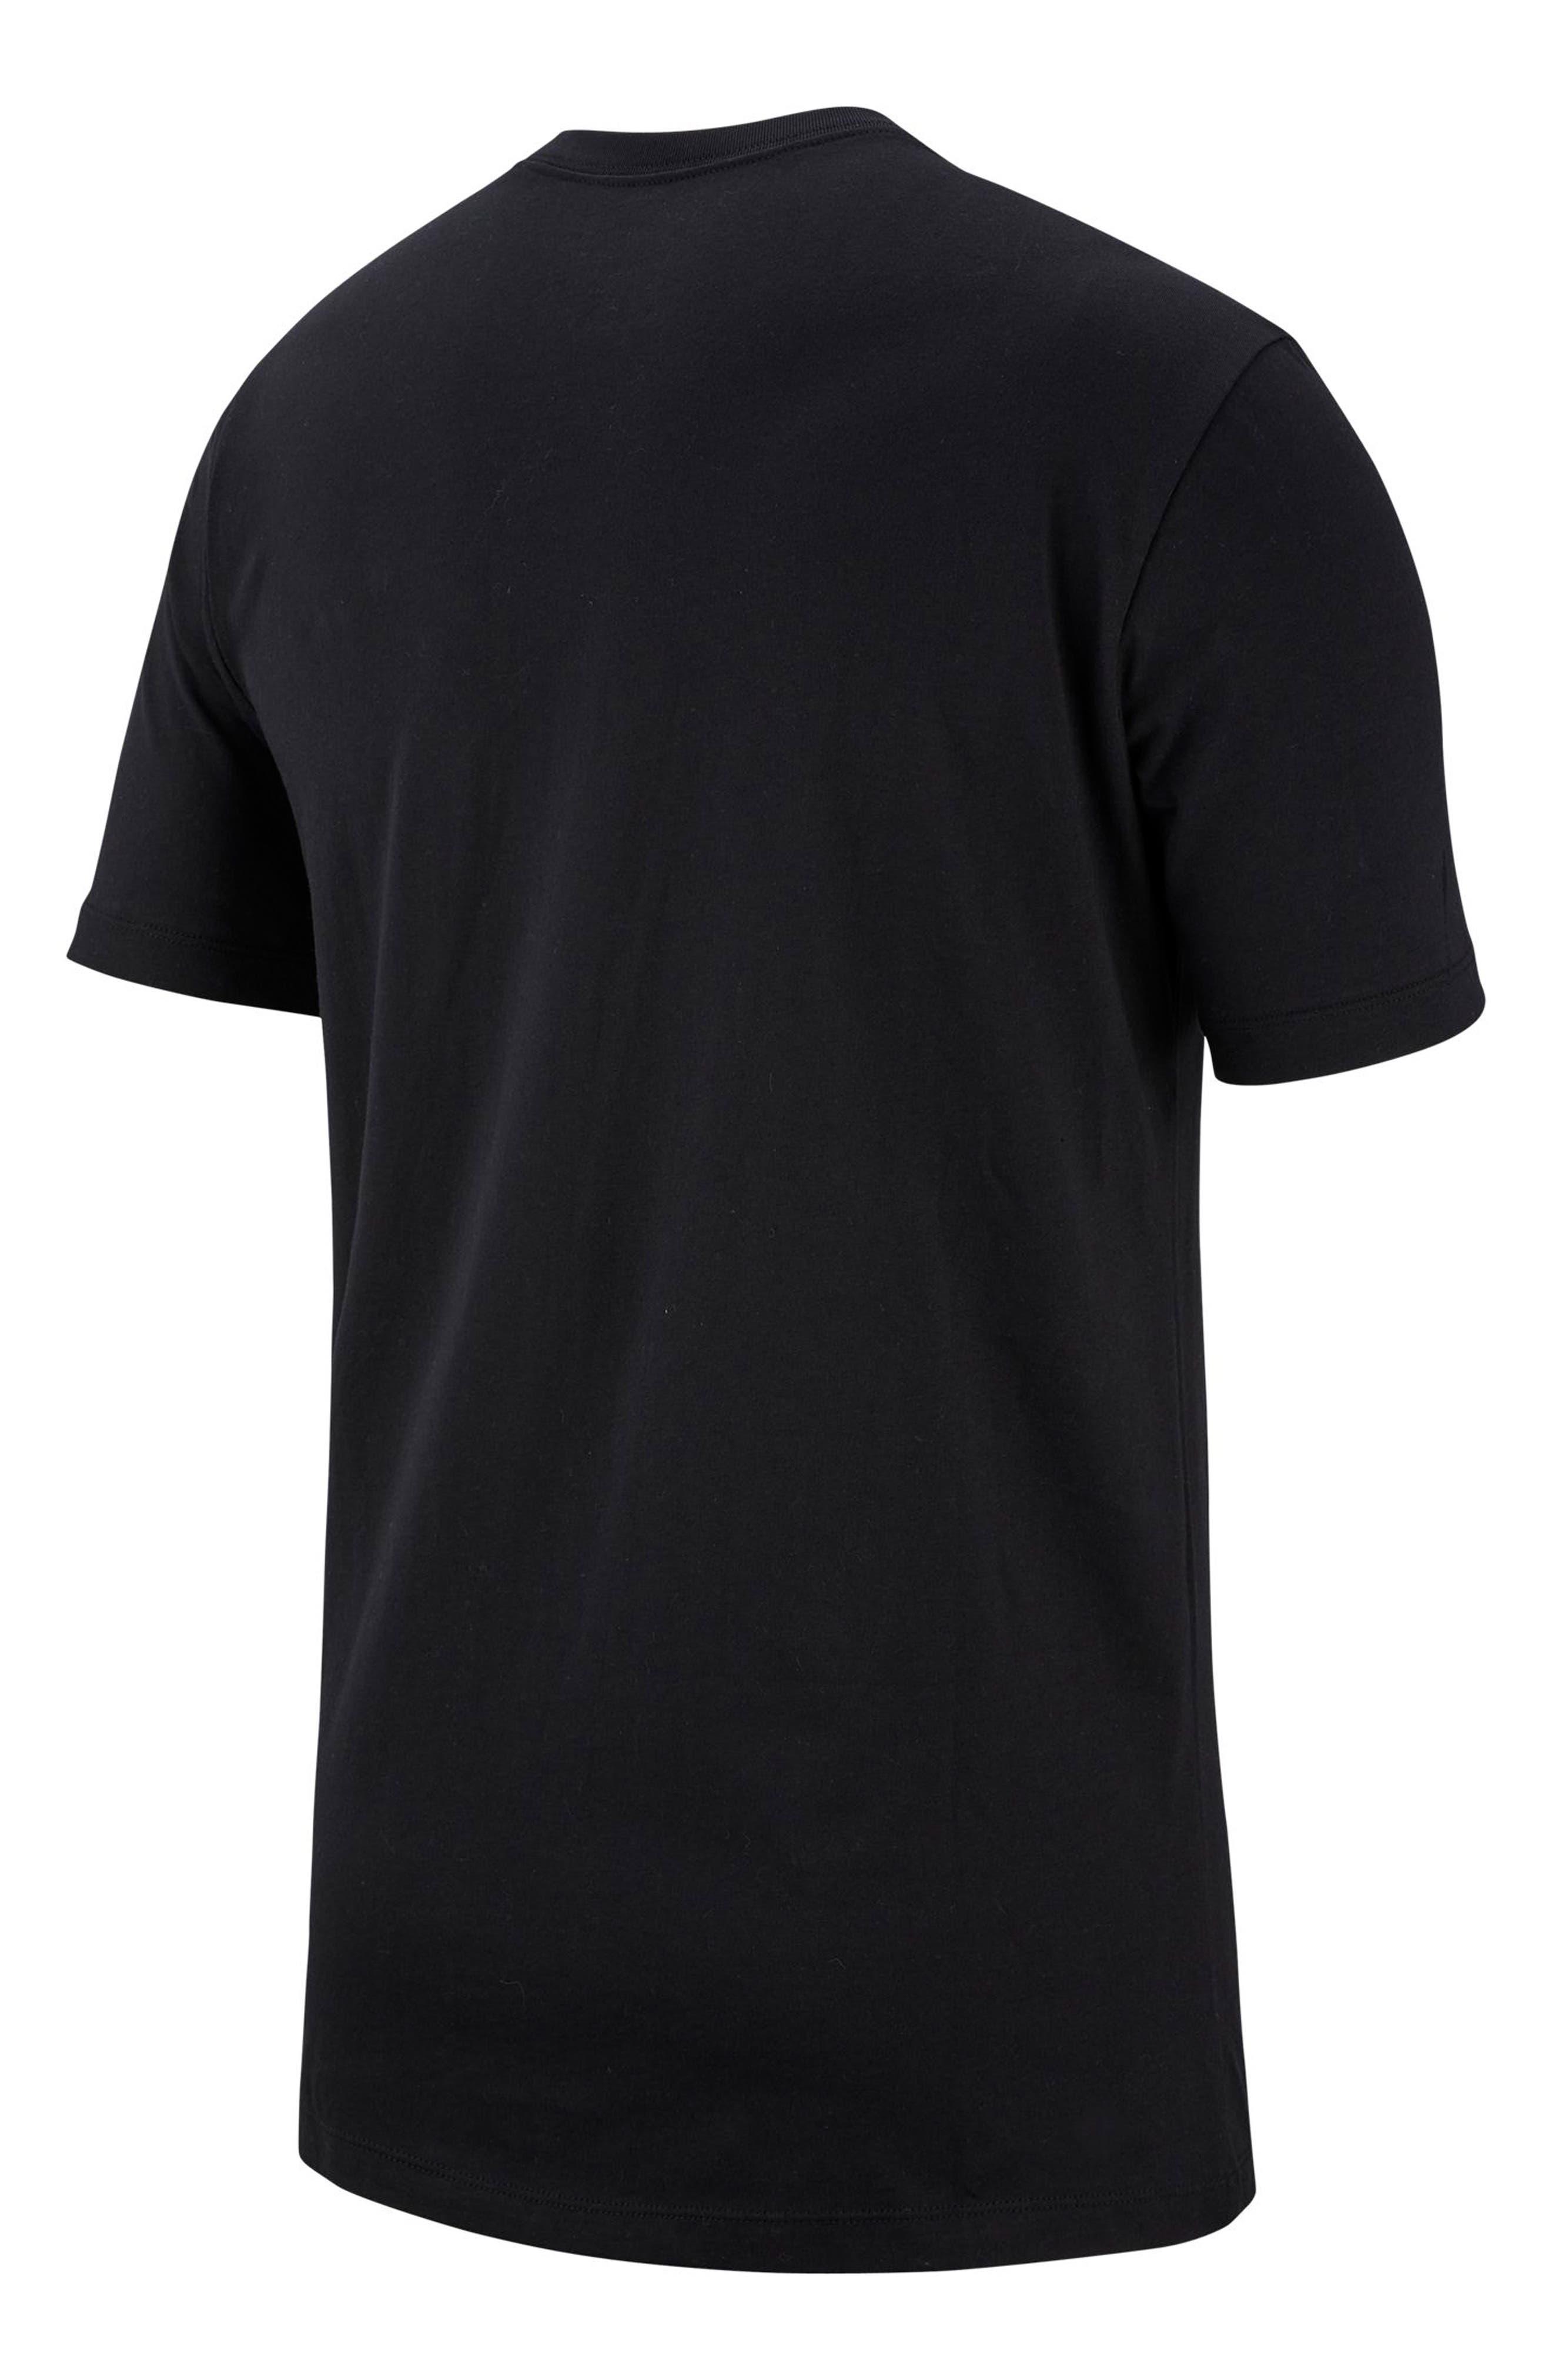 Air Force 1 T-Shirt,                             Alternate thumbnail 7, color,                             BLACK